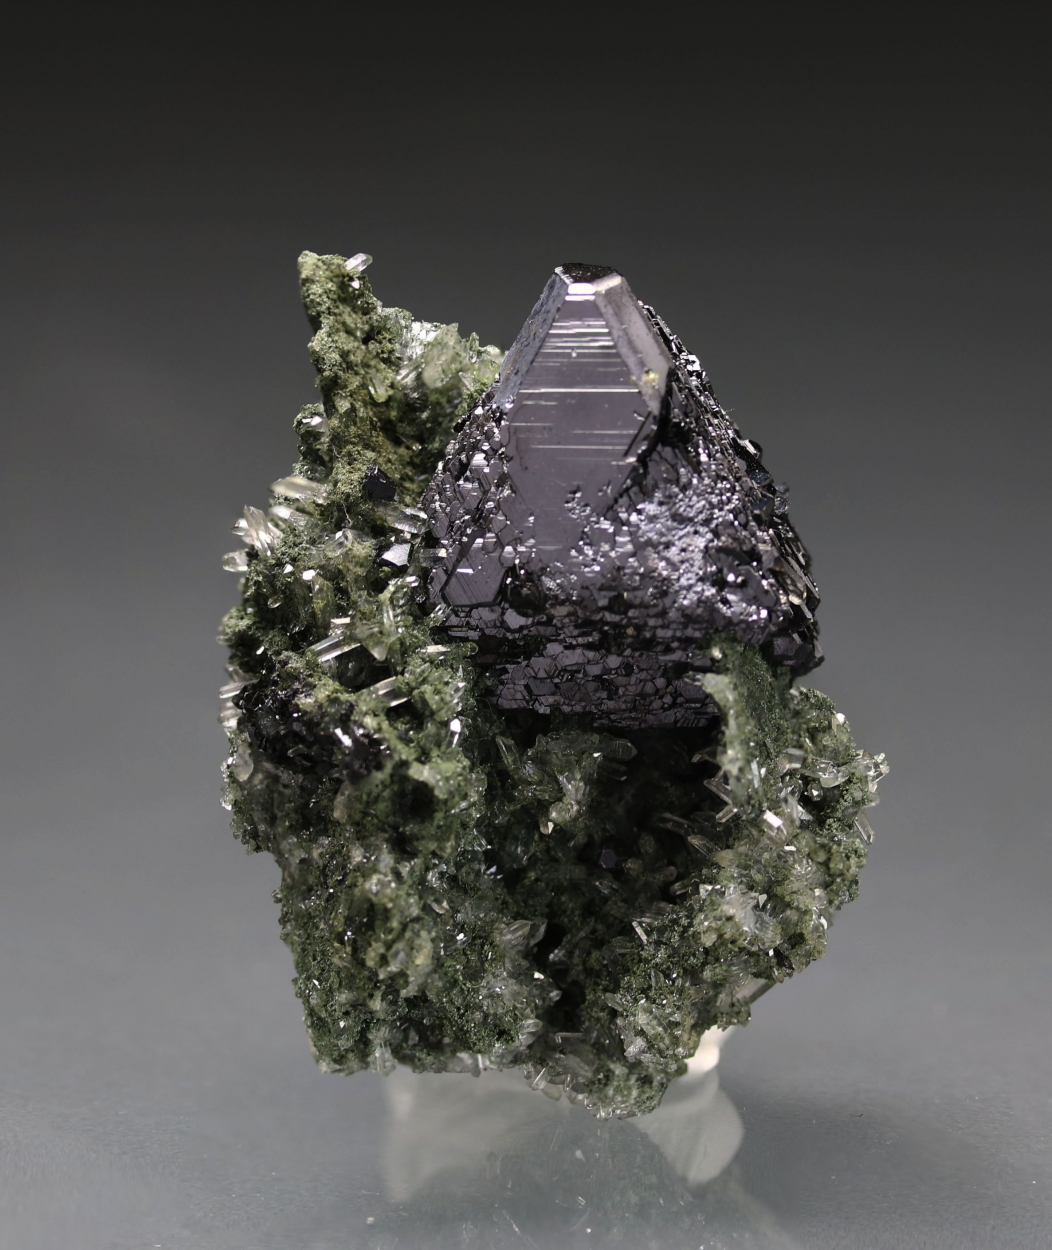 Sphalerite On Quartz With Chlorite